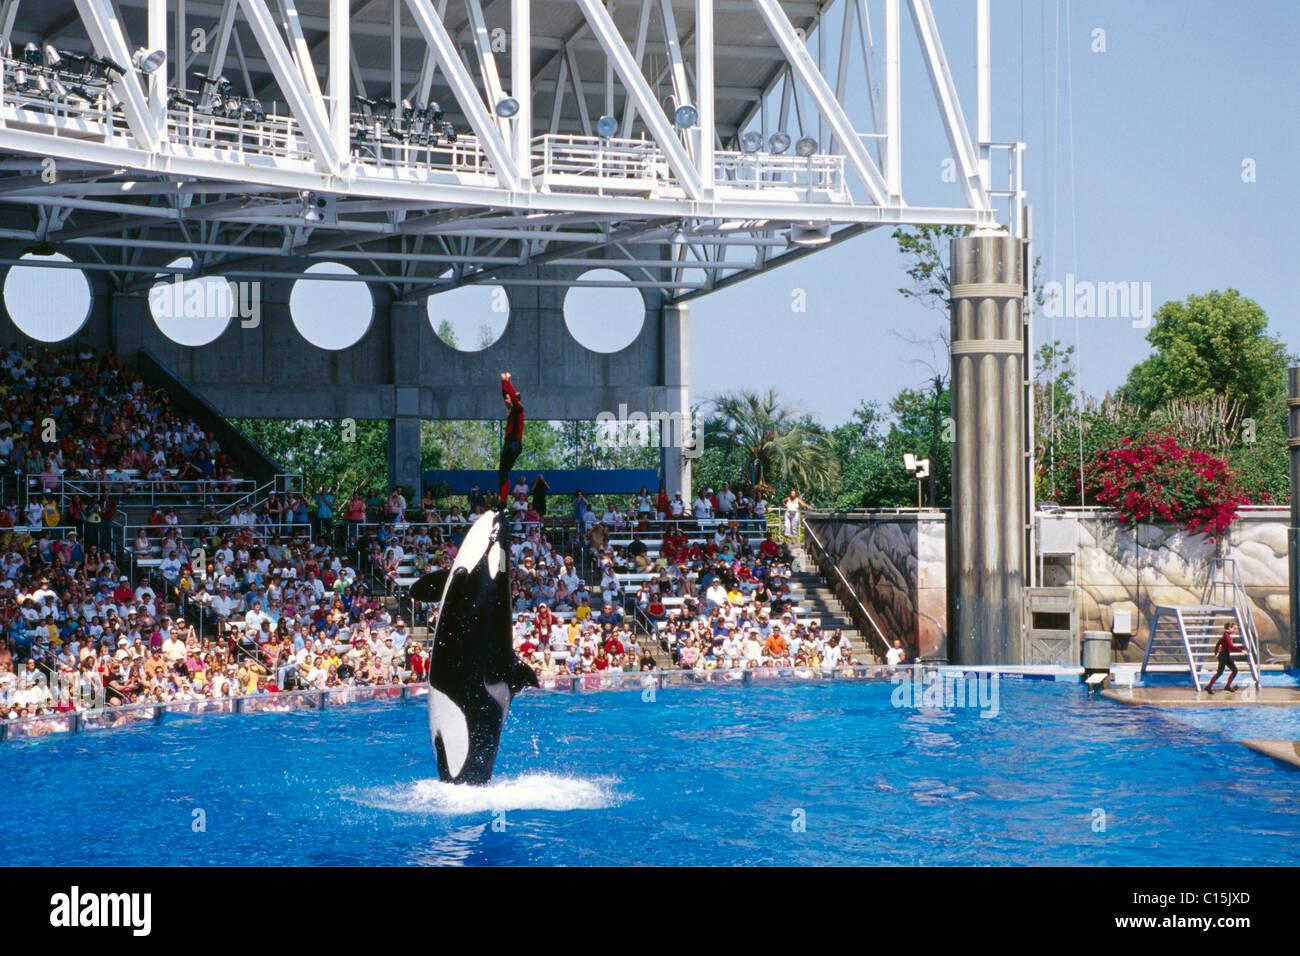 Sea World, Orlando, Florida, USA - Stock Image